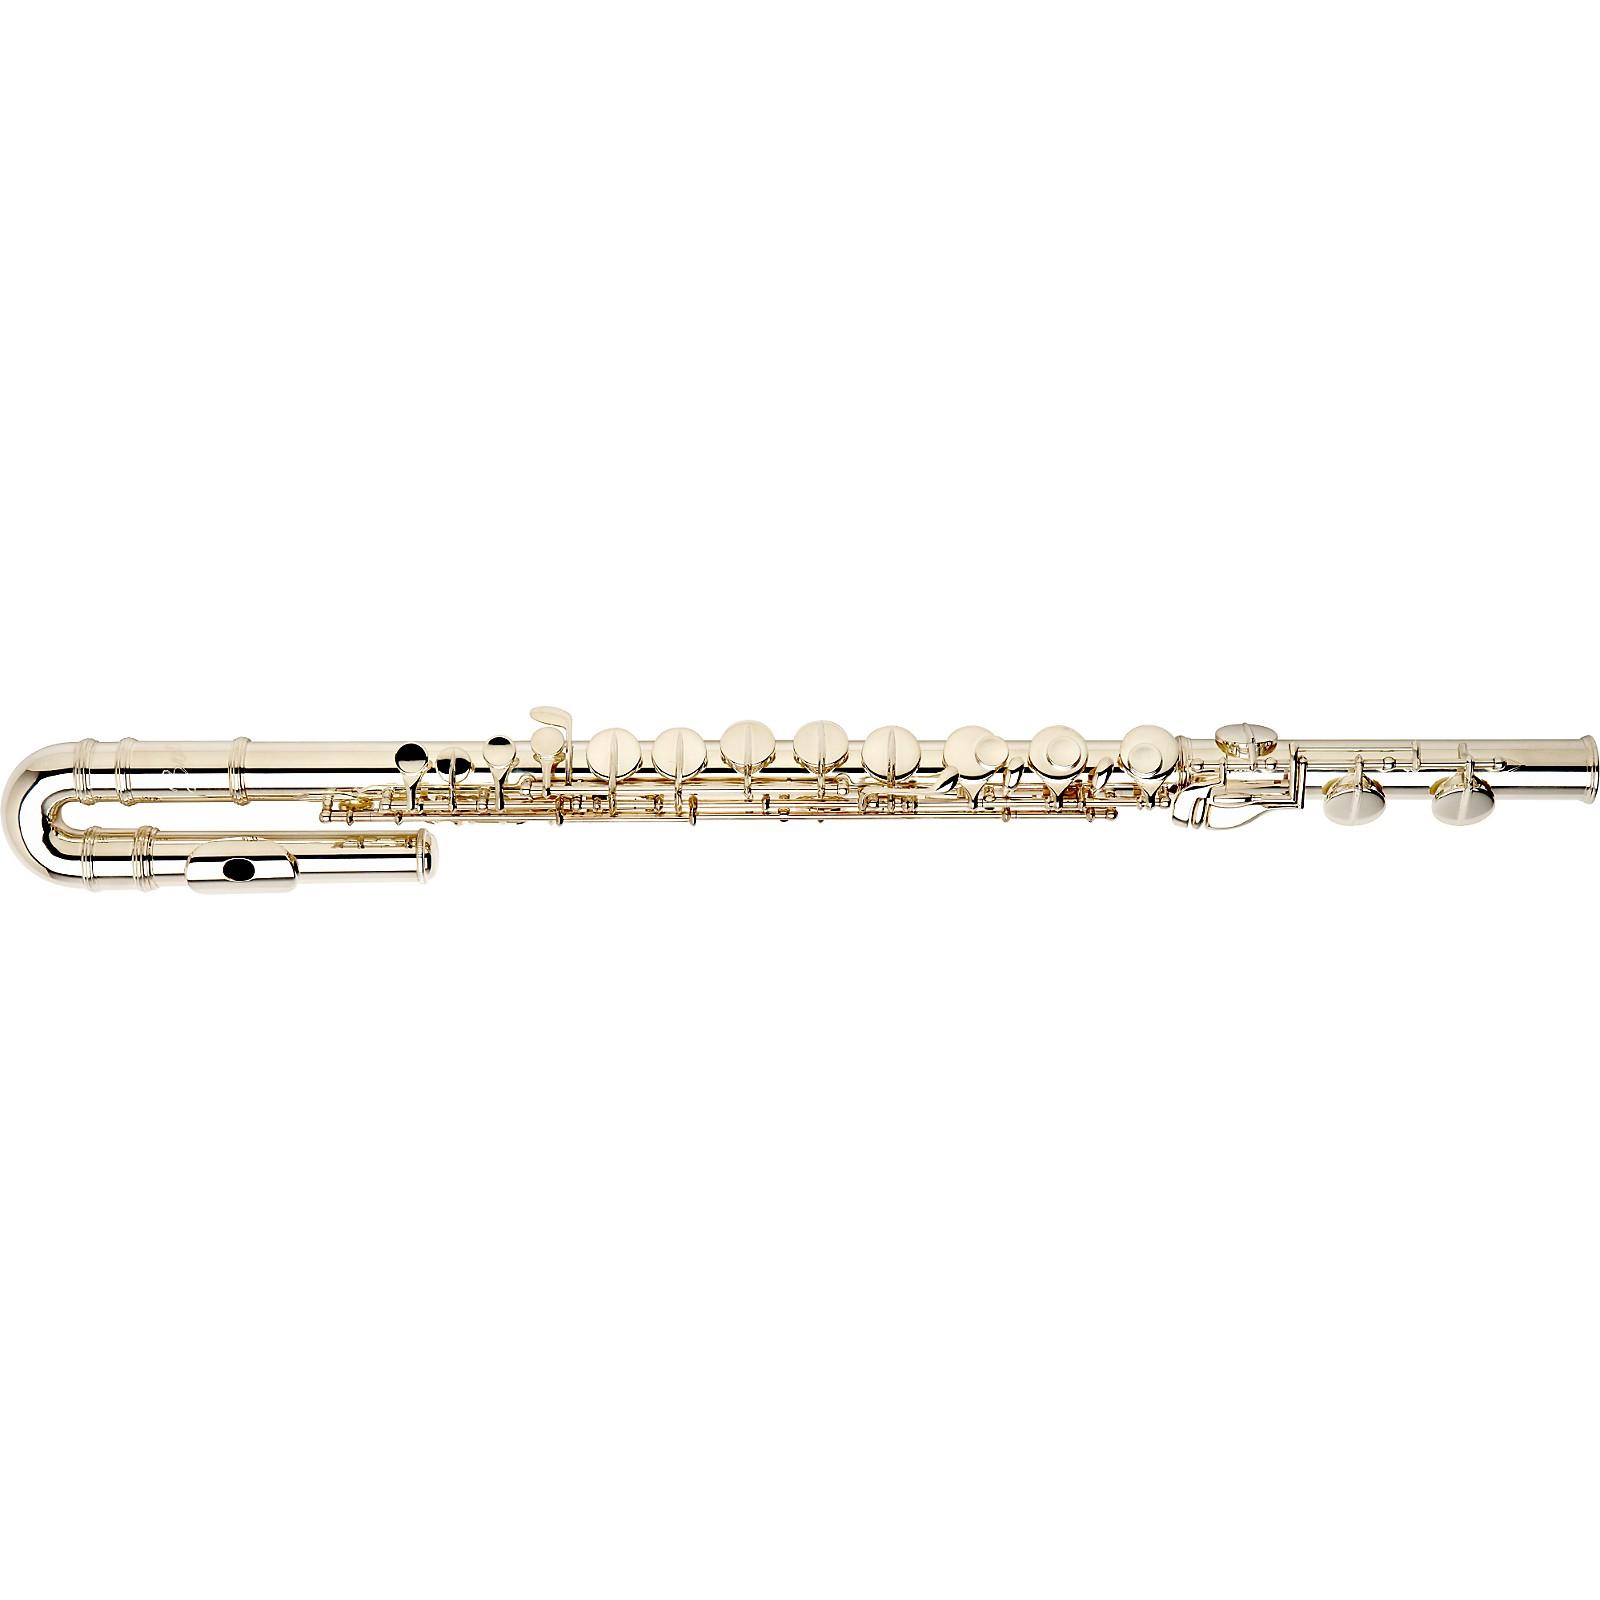 Brio BAF-2 Series Alto Flute